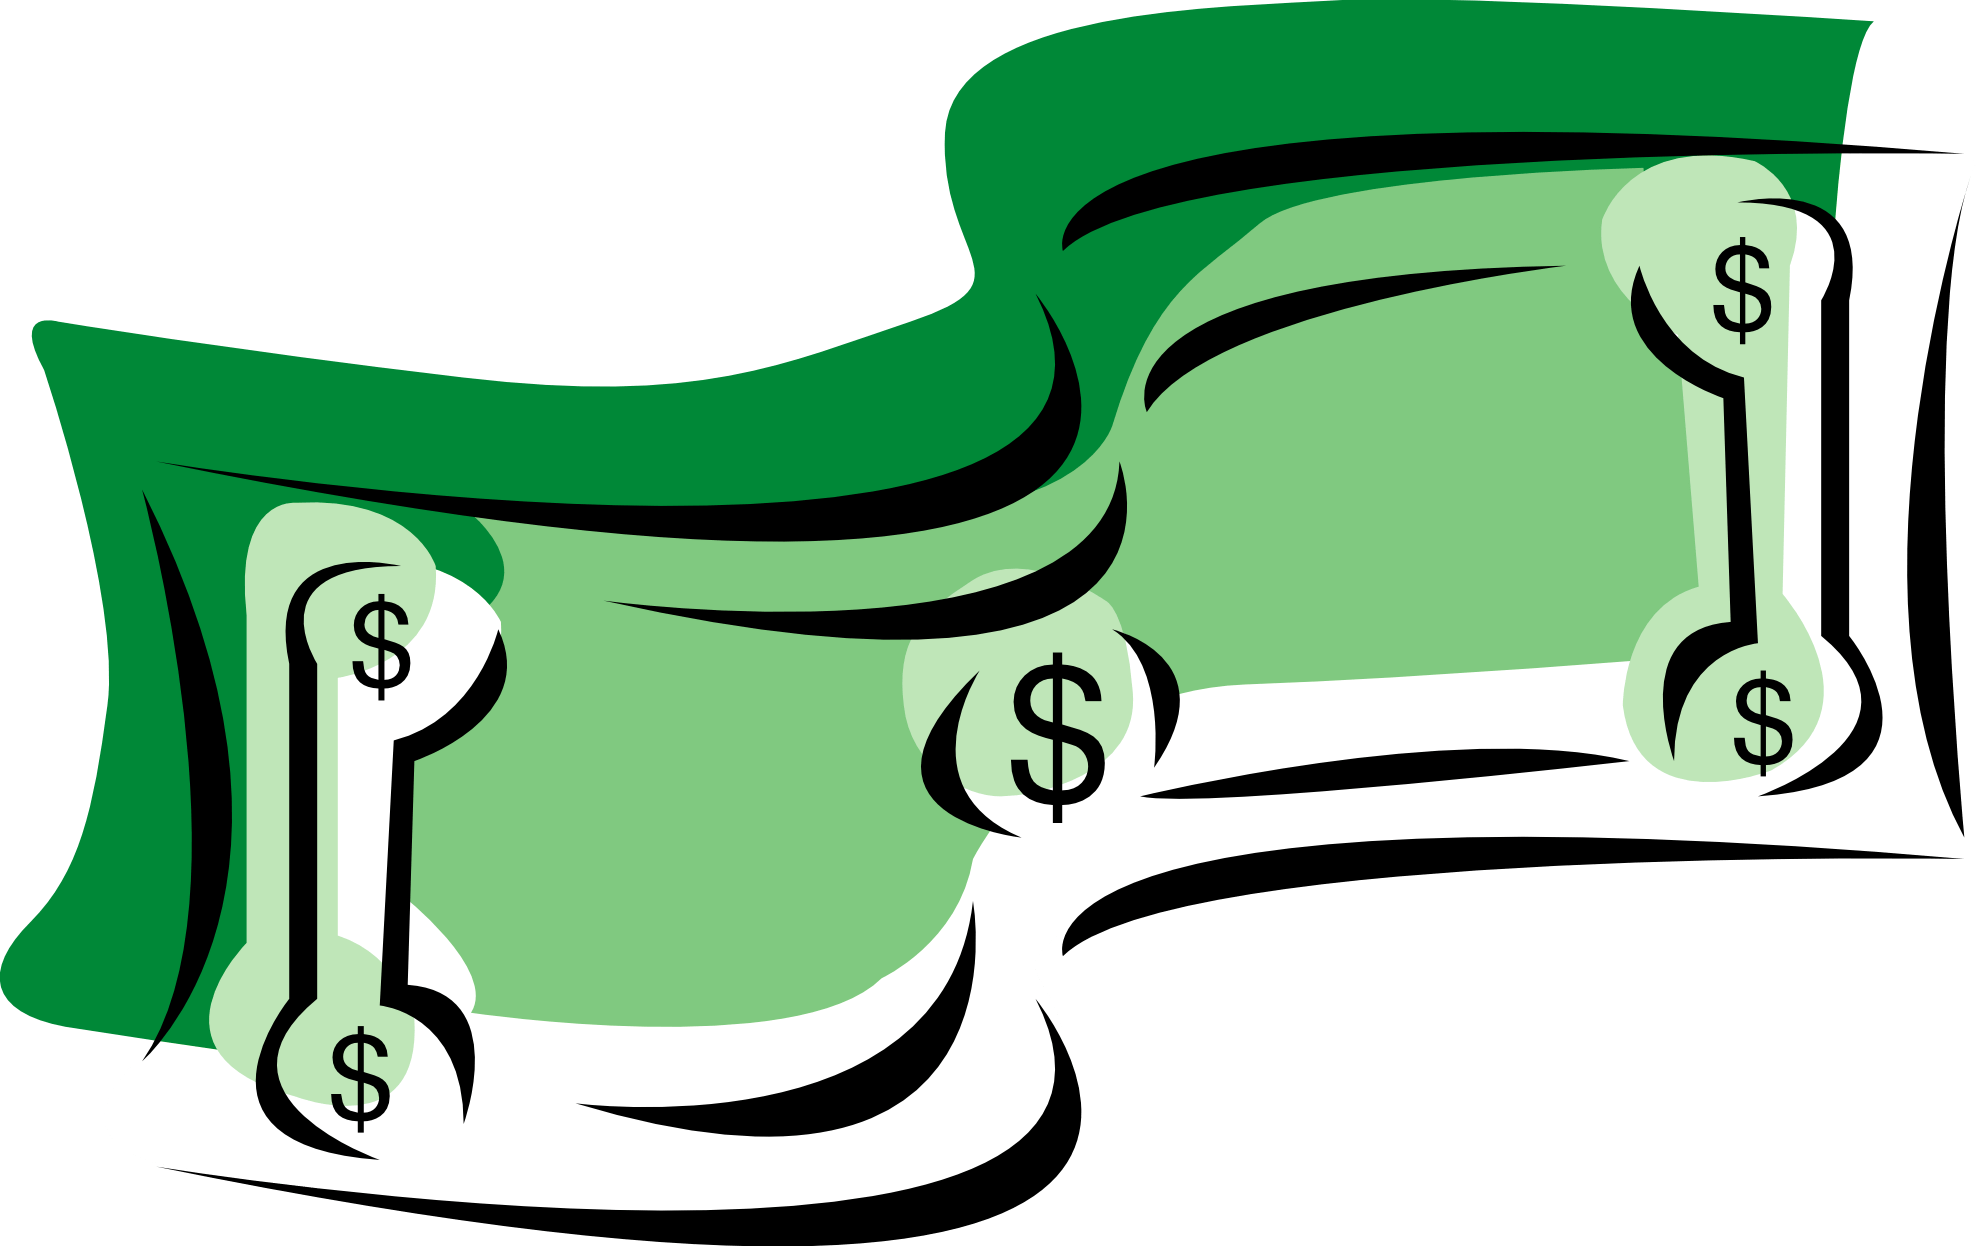 Money clipart printable green image stock Cowboy Money Cliparts - Cliparts Zone image stock